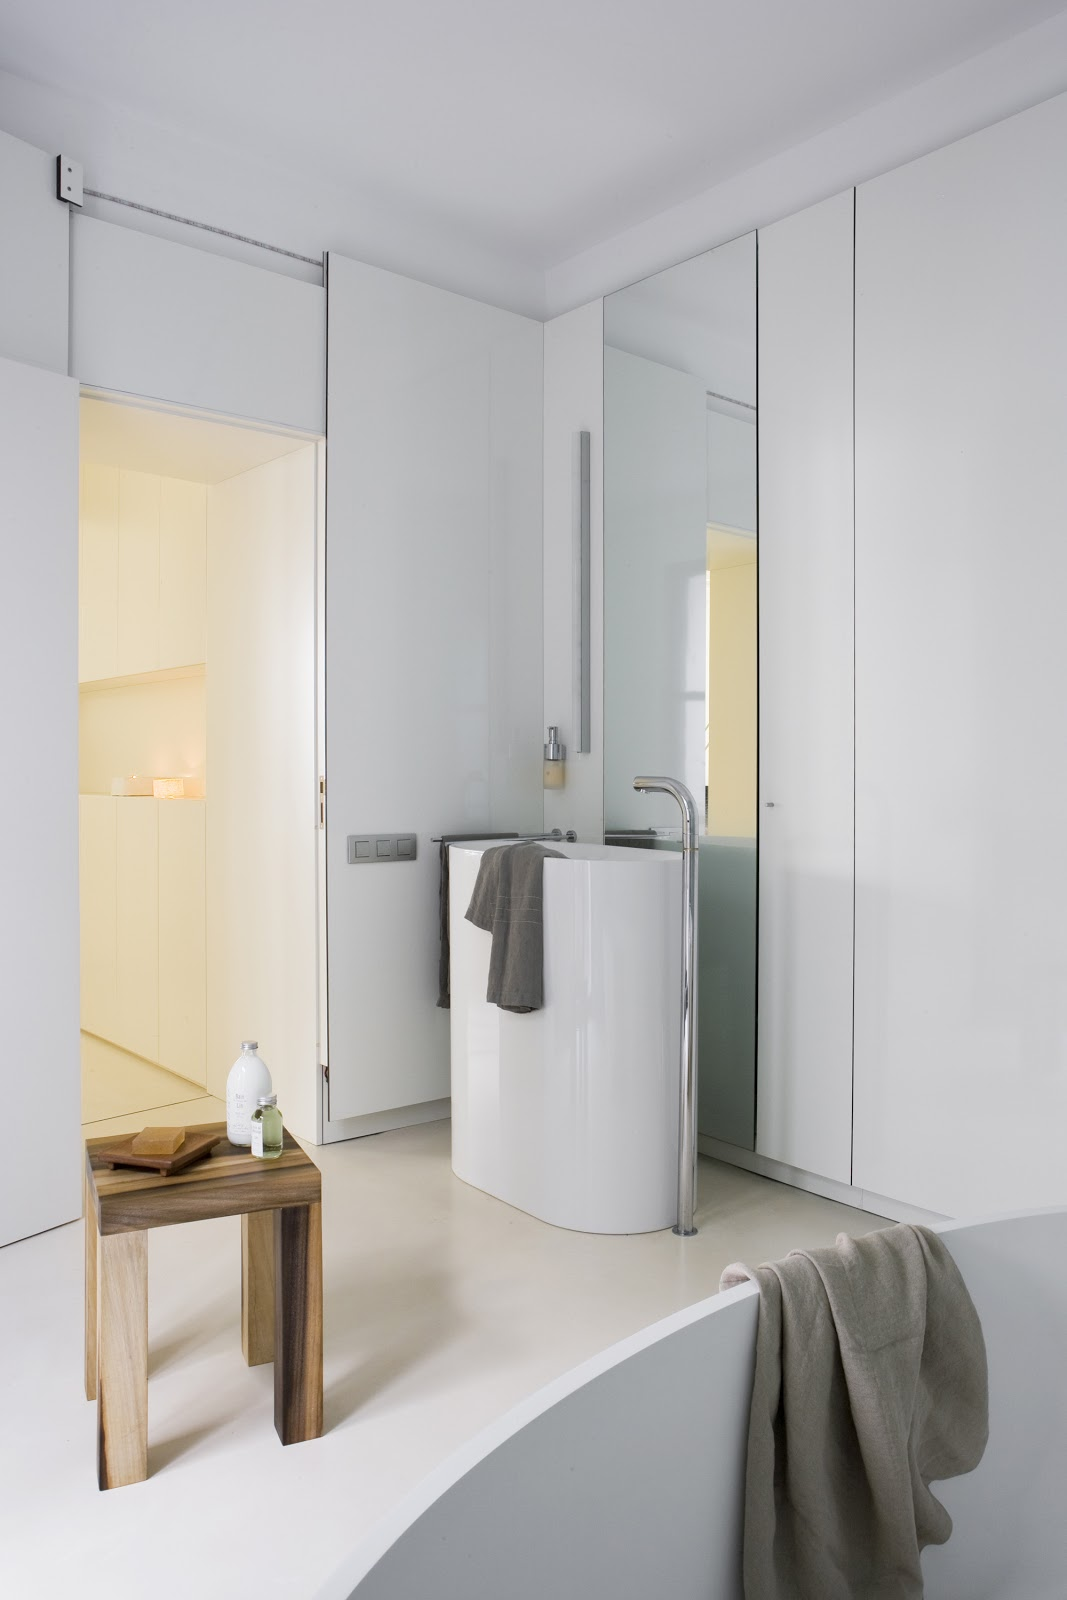 Accesorios De Baño Cromados Modernos: de suelo de lavabo y bañera d38 de supergrifaccesorios cromados tara